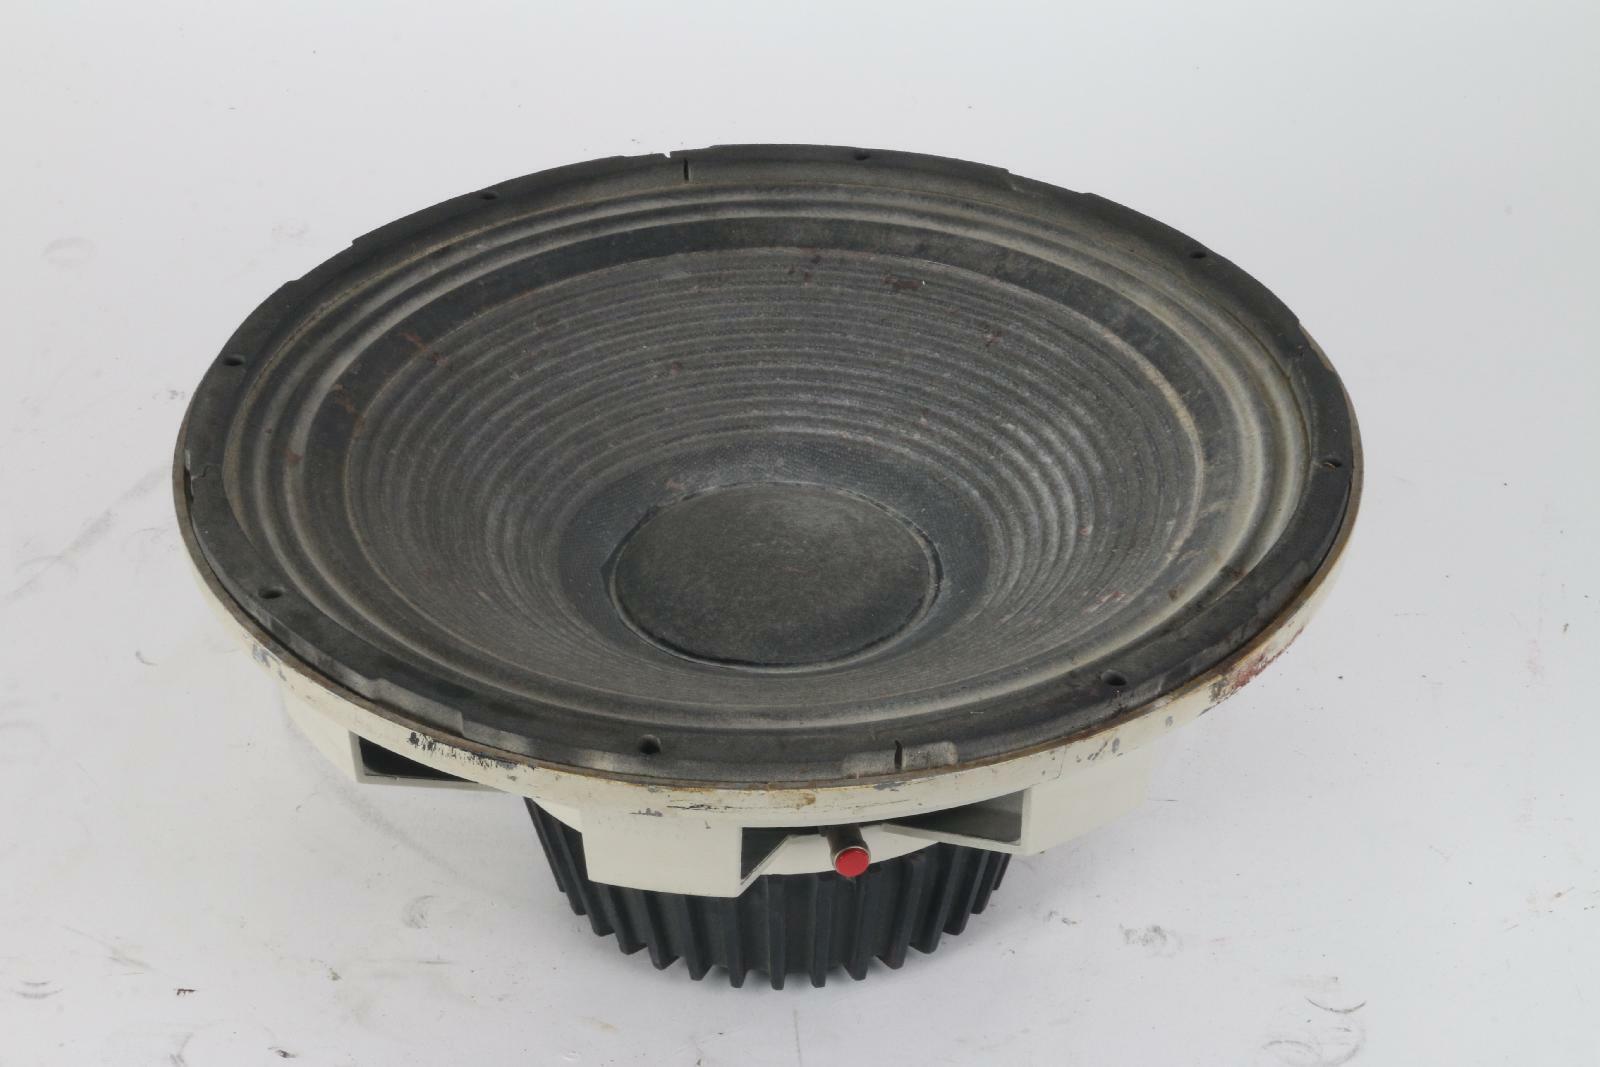 Cetec Gauss 15  5840 8 OHM Loudspeaker Speaker - Single